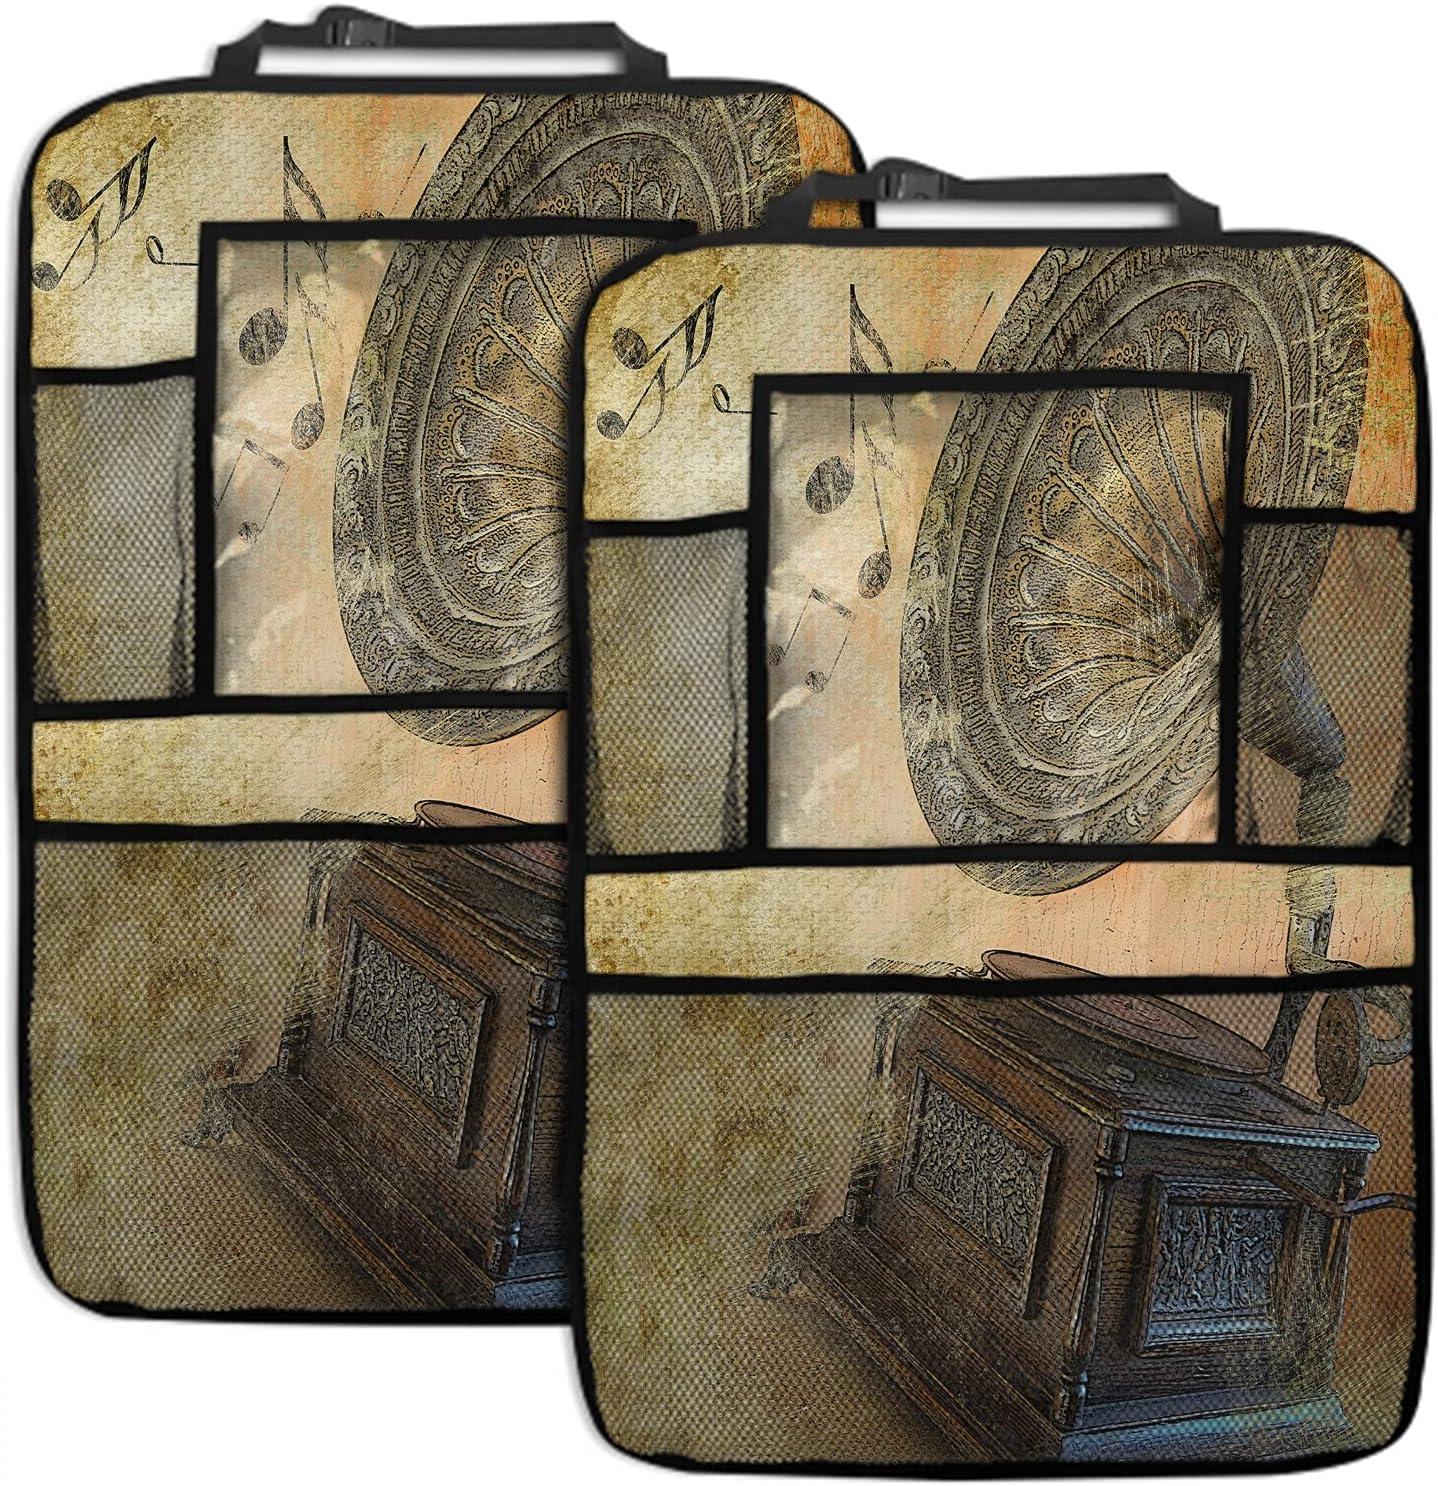 EKOBLA Gramophone 35% OFF 2 Pack Car Organizer Inch Seat Oklahoma City Mall Bac 19x27.5